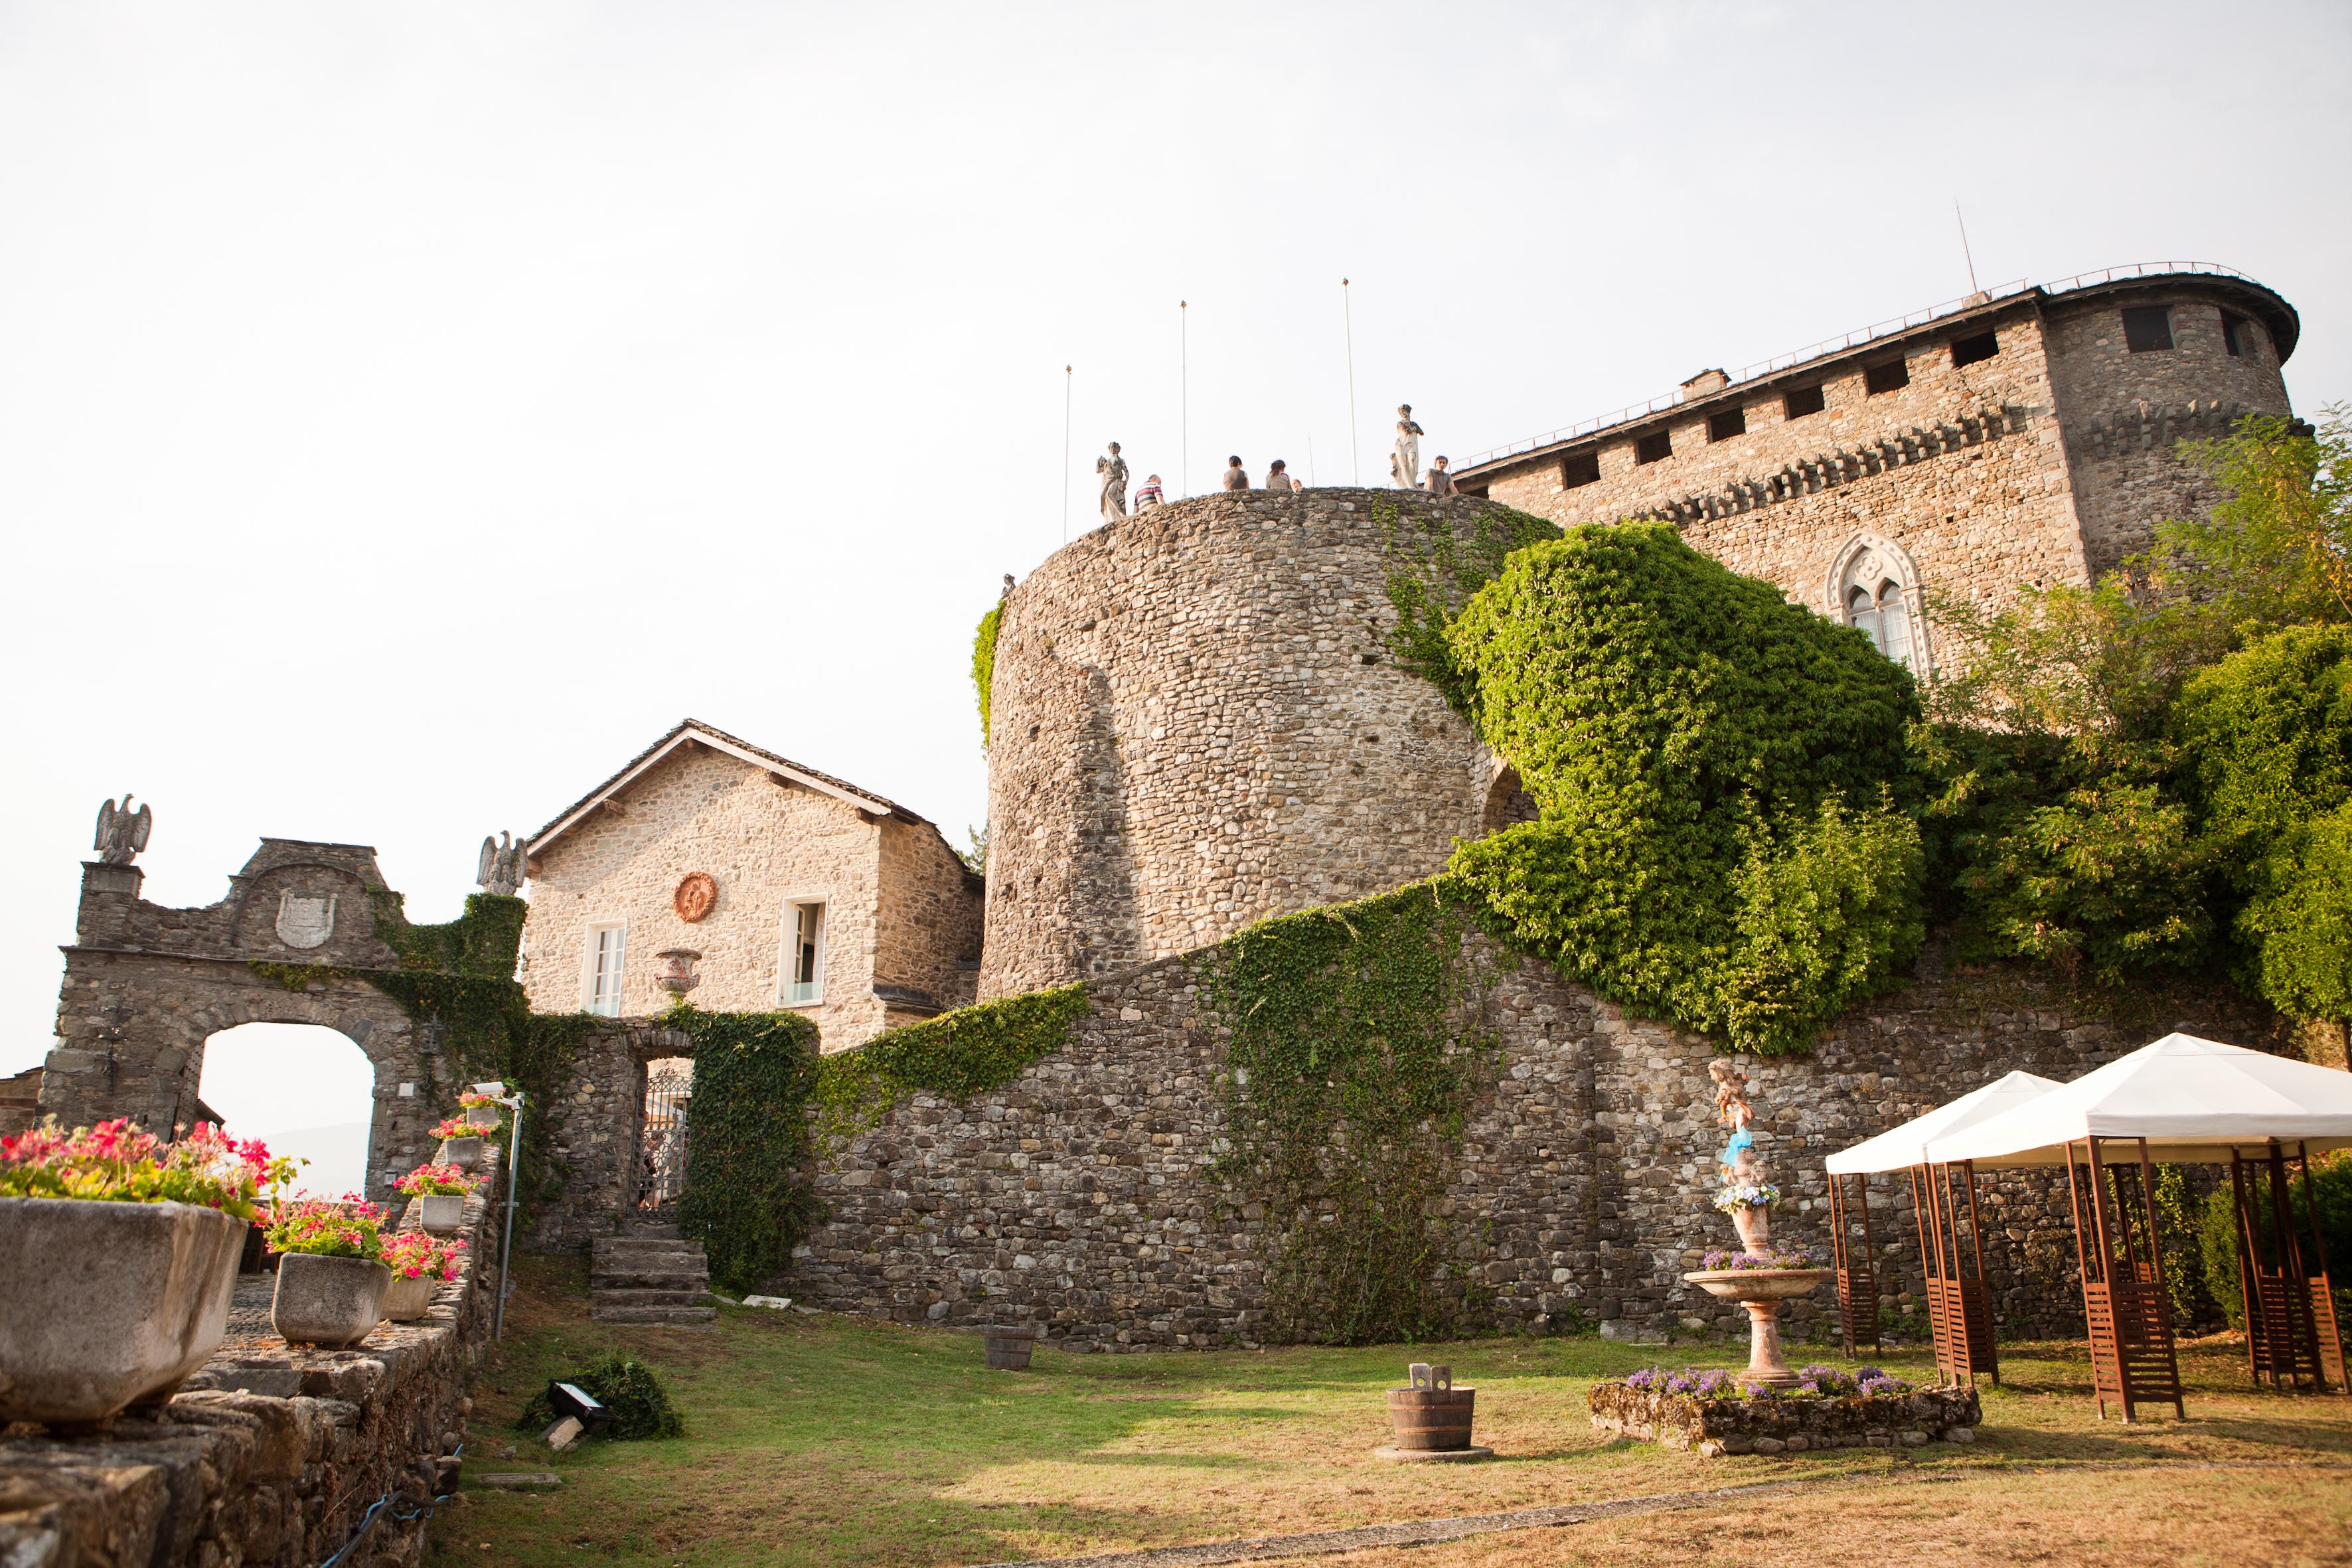 castello - veduta arco di ingresso